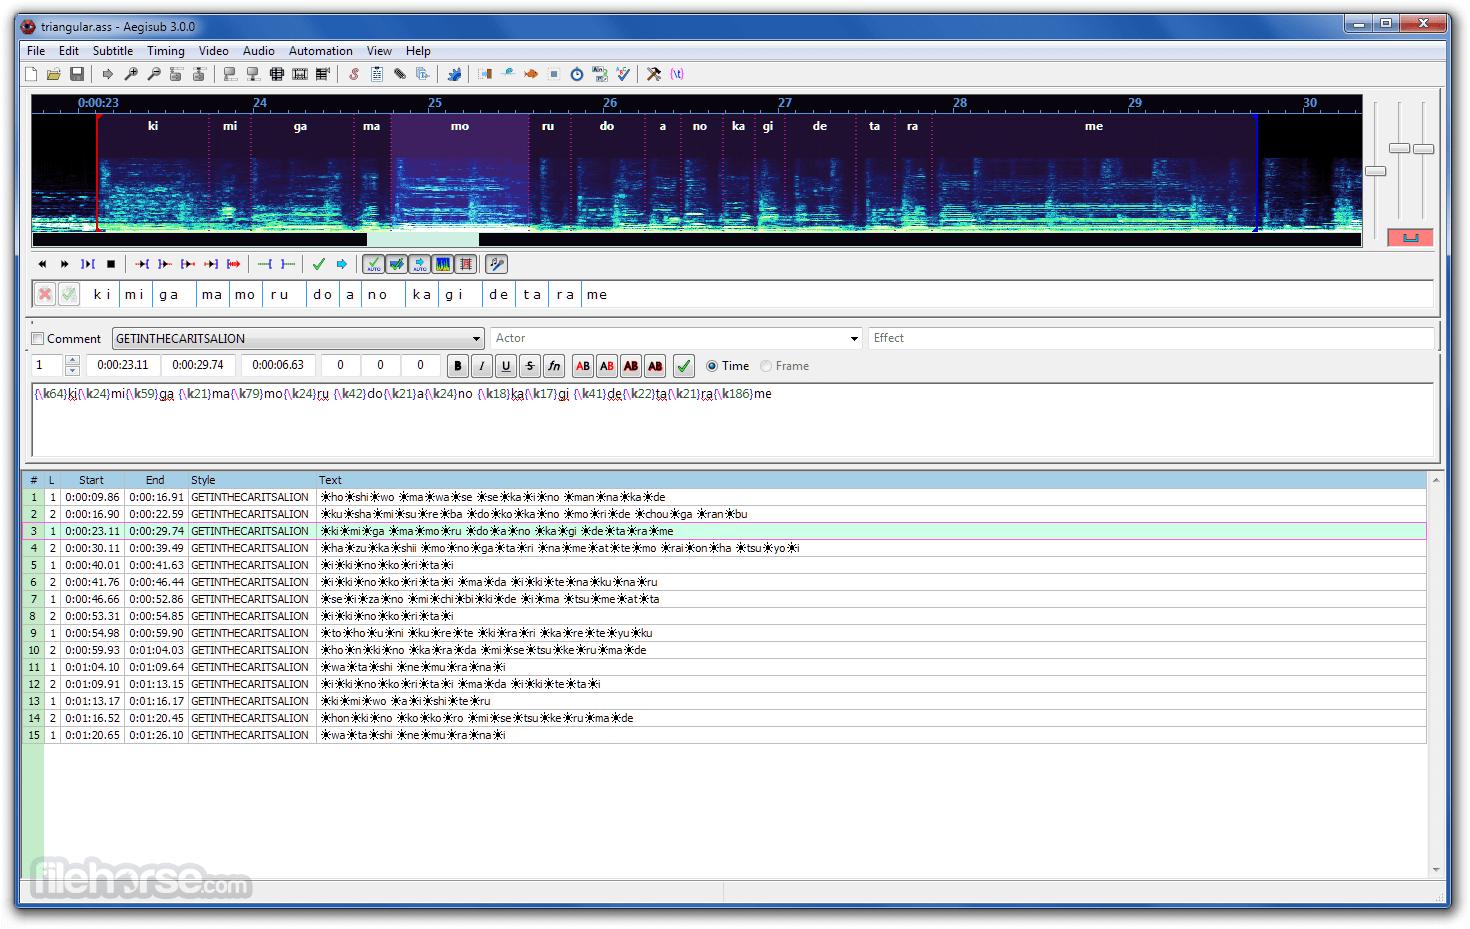 Aegisub 3.2.2 (64-bit) Screenshot 3